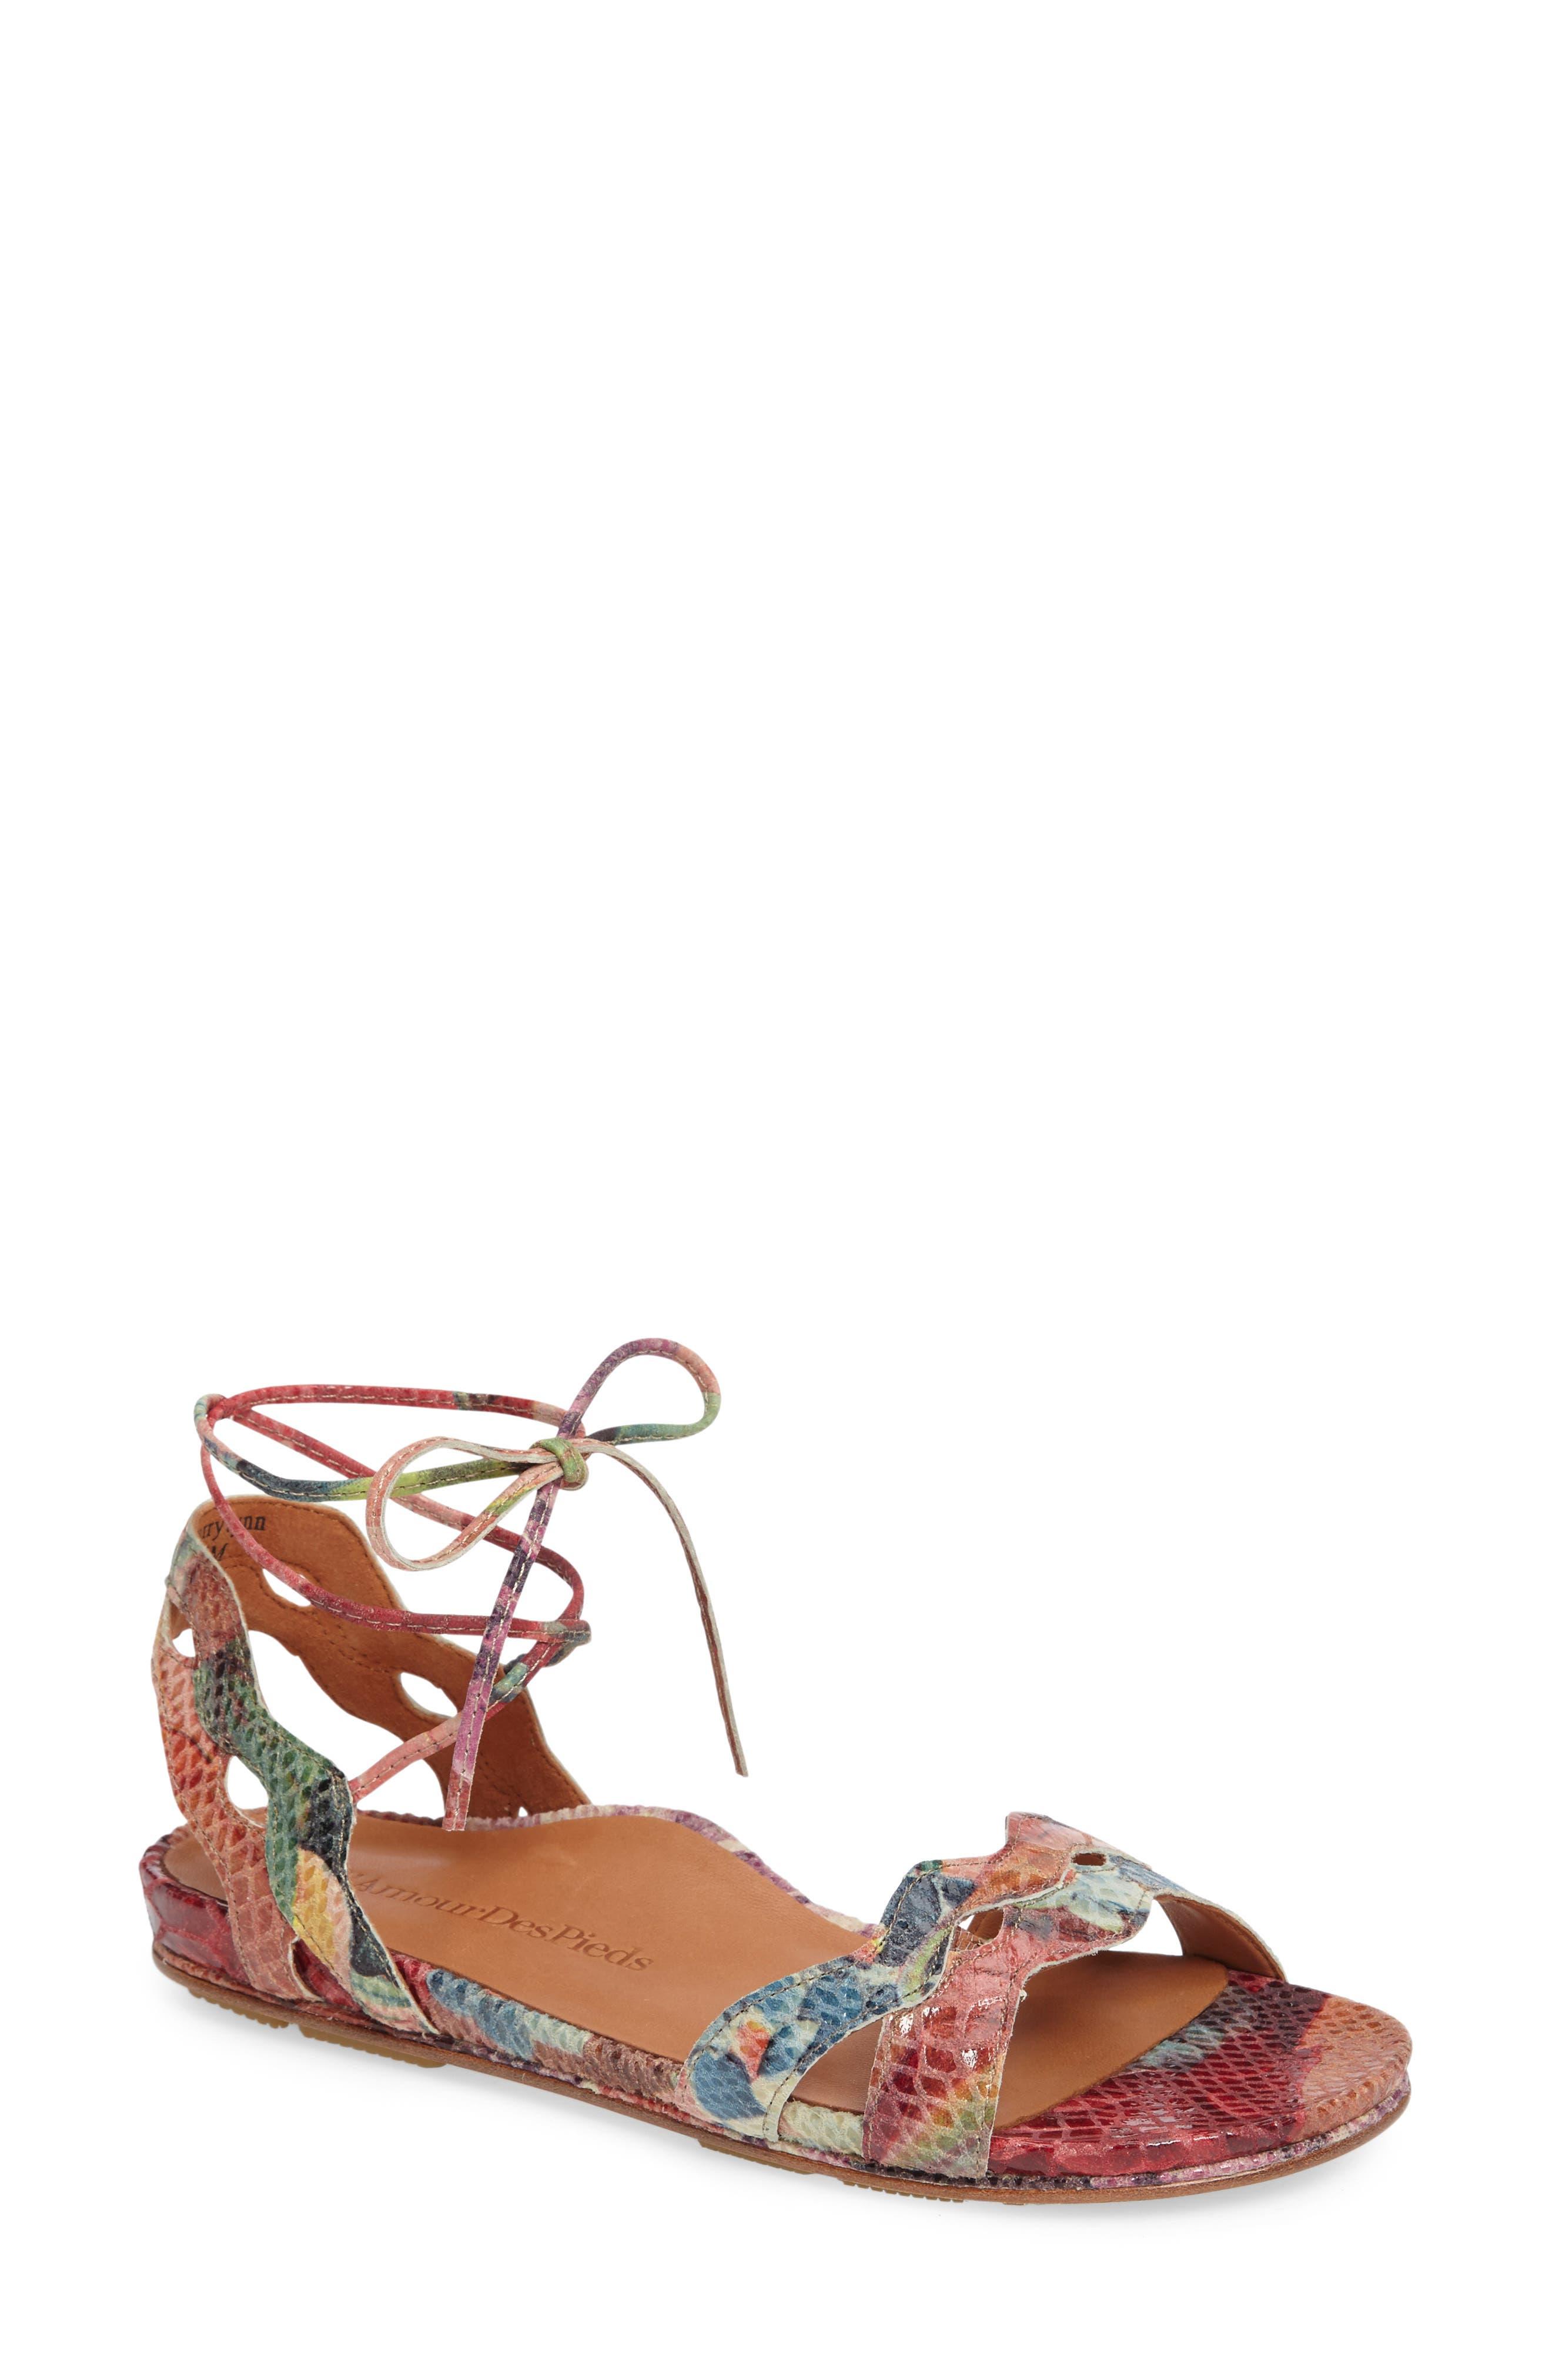 Darrylynn Wraparound Lace-Up Sandal,                             Main thumbnail 2, color,